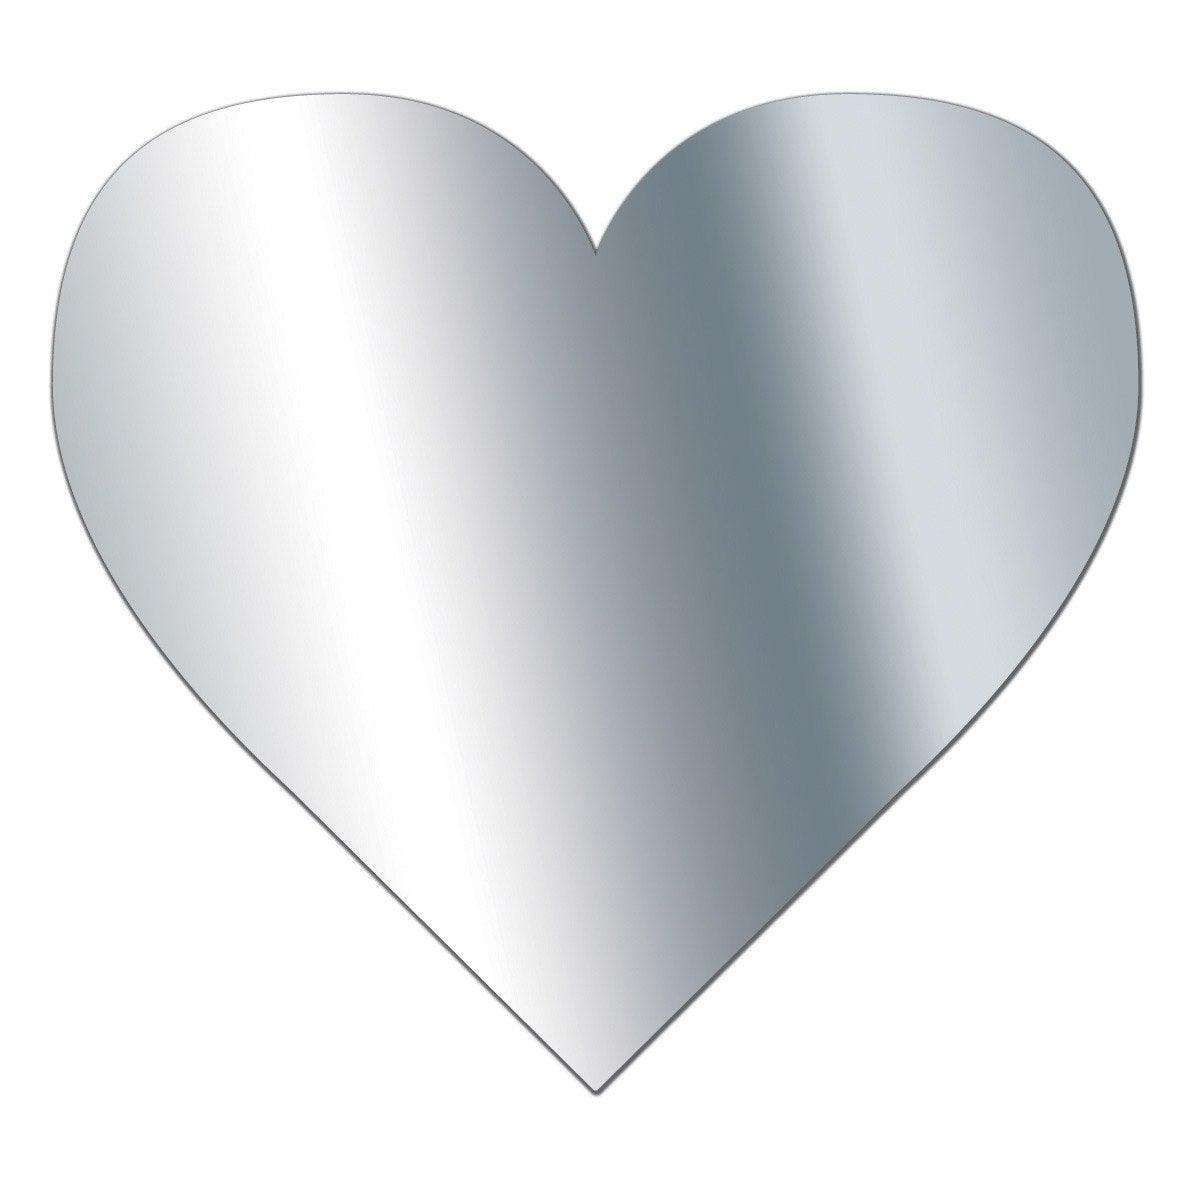 Miroir En Plexiglass Coeur 10 Cm X 10 Cm Leroy Merlin